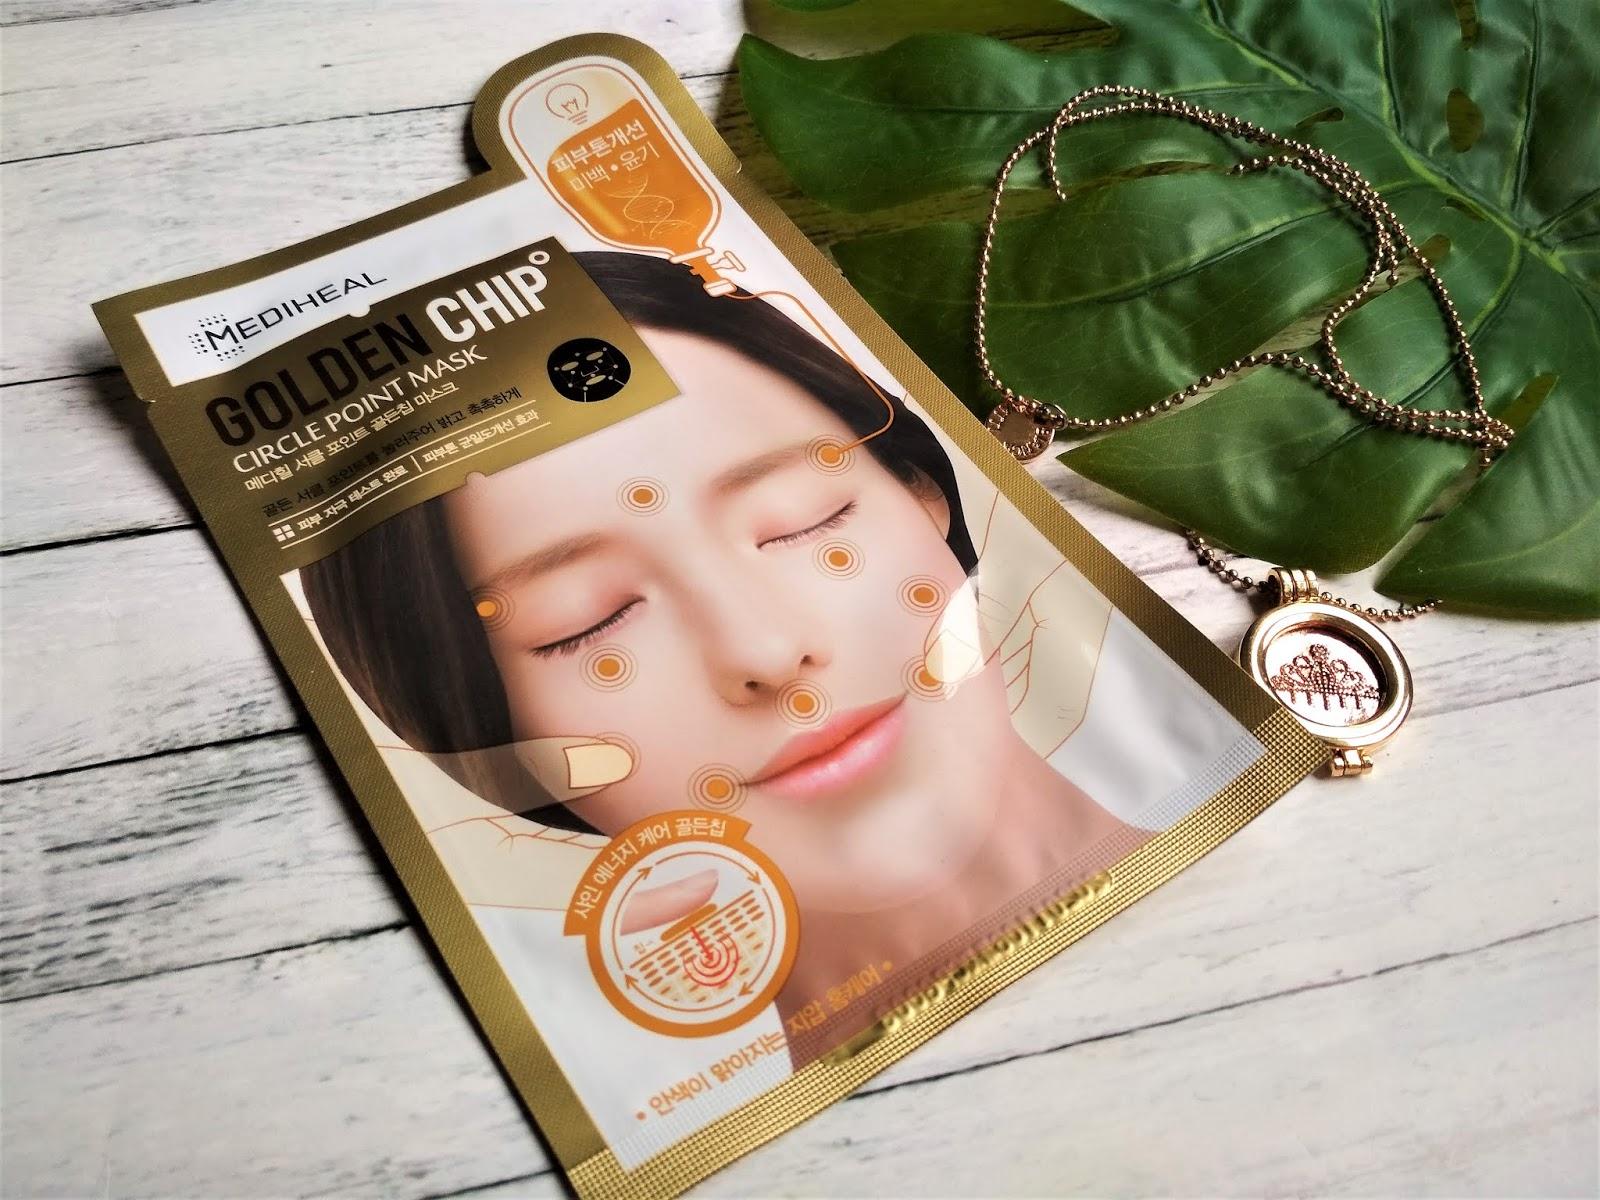 Mediheal Golden Chip Maska rozjaśniająca